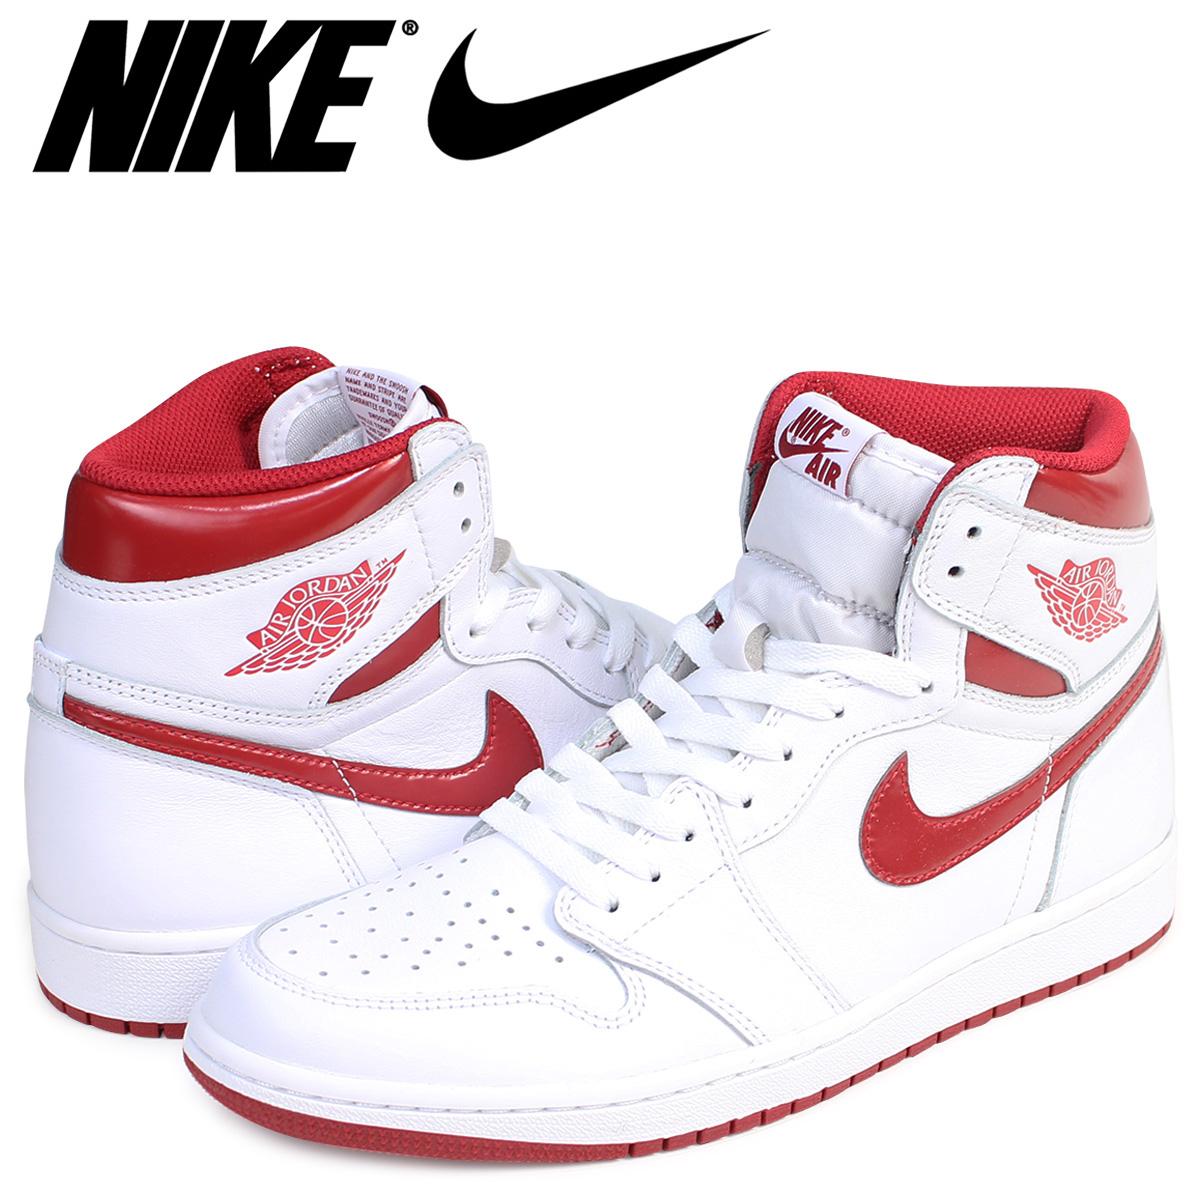 nike jo Shop Clothing \u0026 Shoes Online